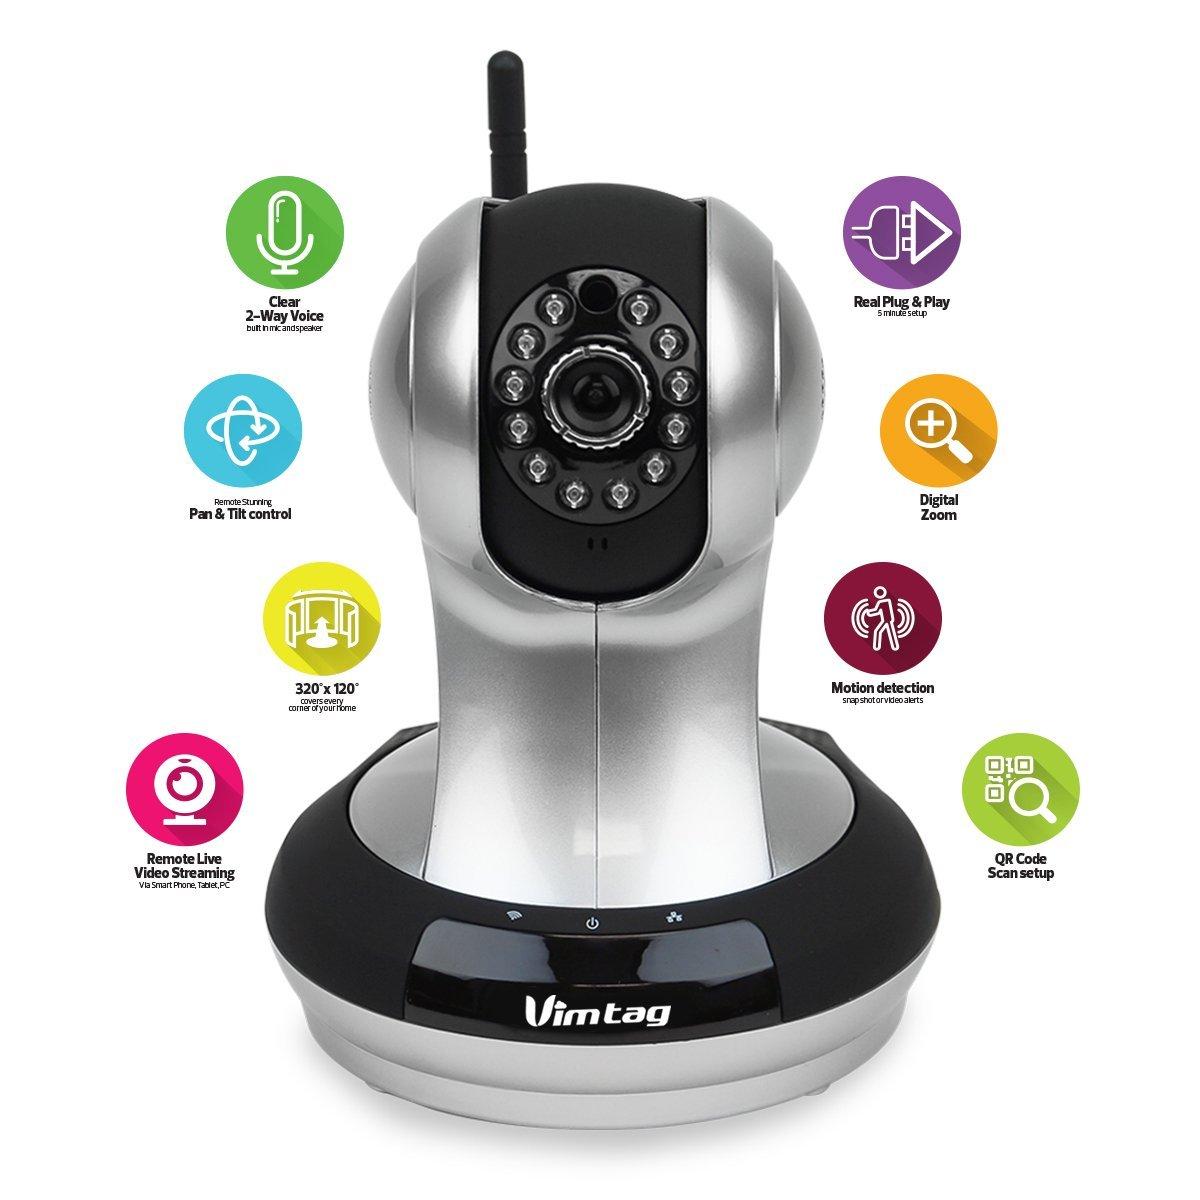 vimtag security camera